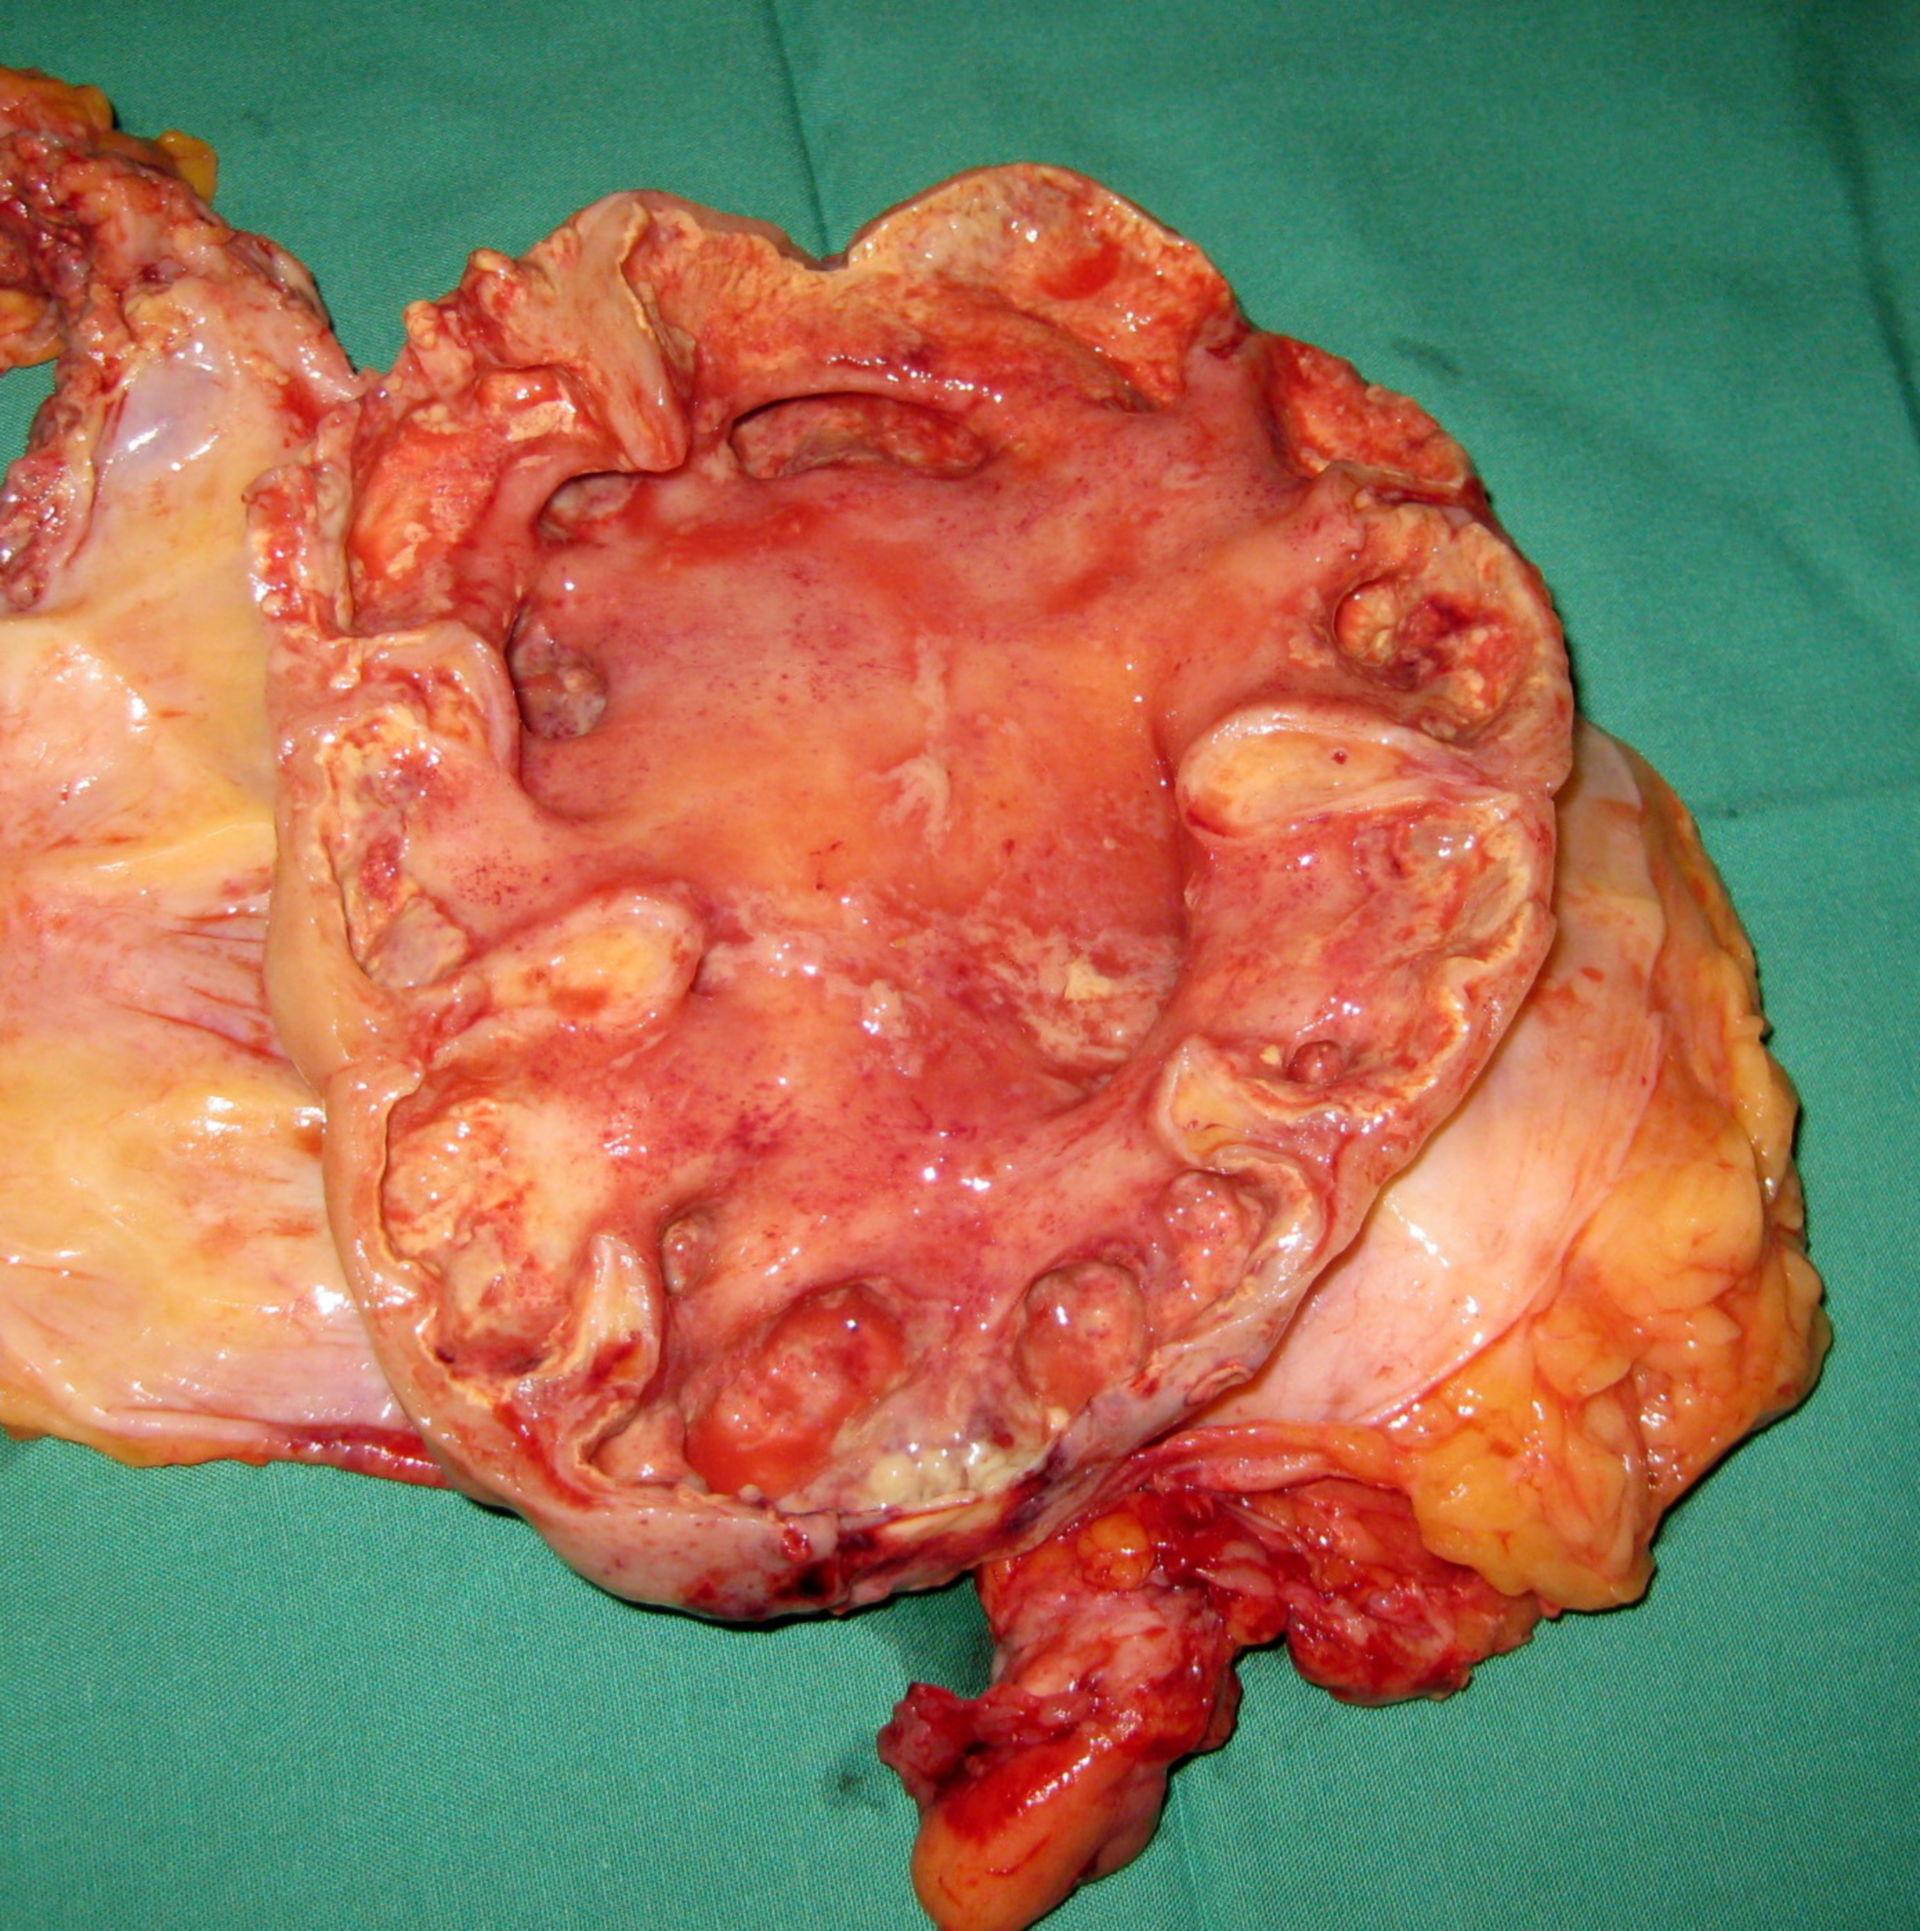 Pyonephrosis - cross-section